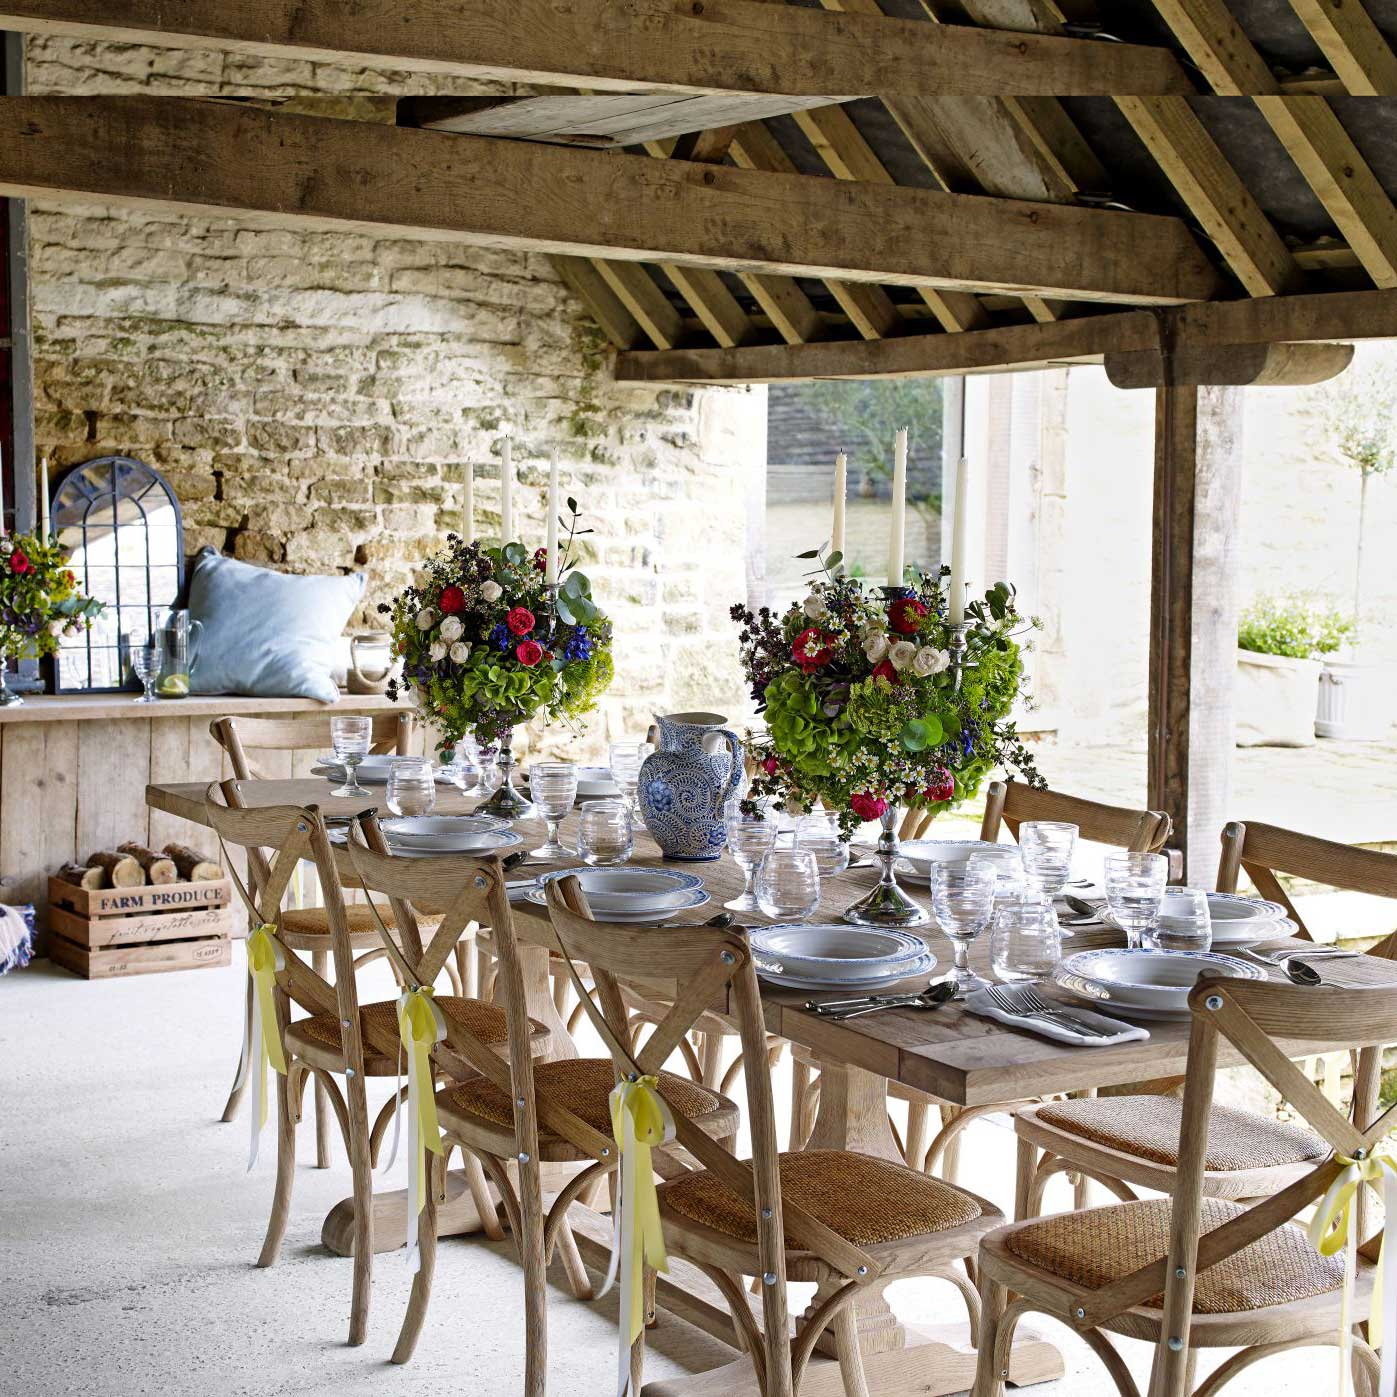 1.-John-Lewis-Isabelle-Chair-oak-£125,-Marcelle-extending-dining-table-£1200,-Outdoor-mirror-£60.jpg